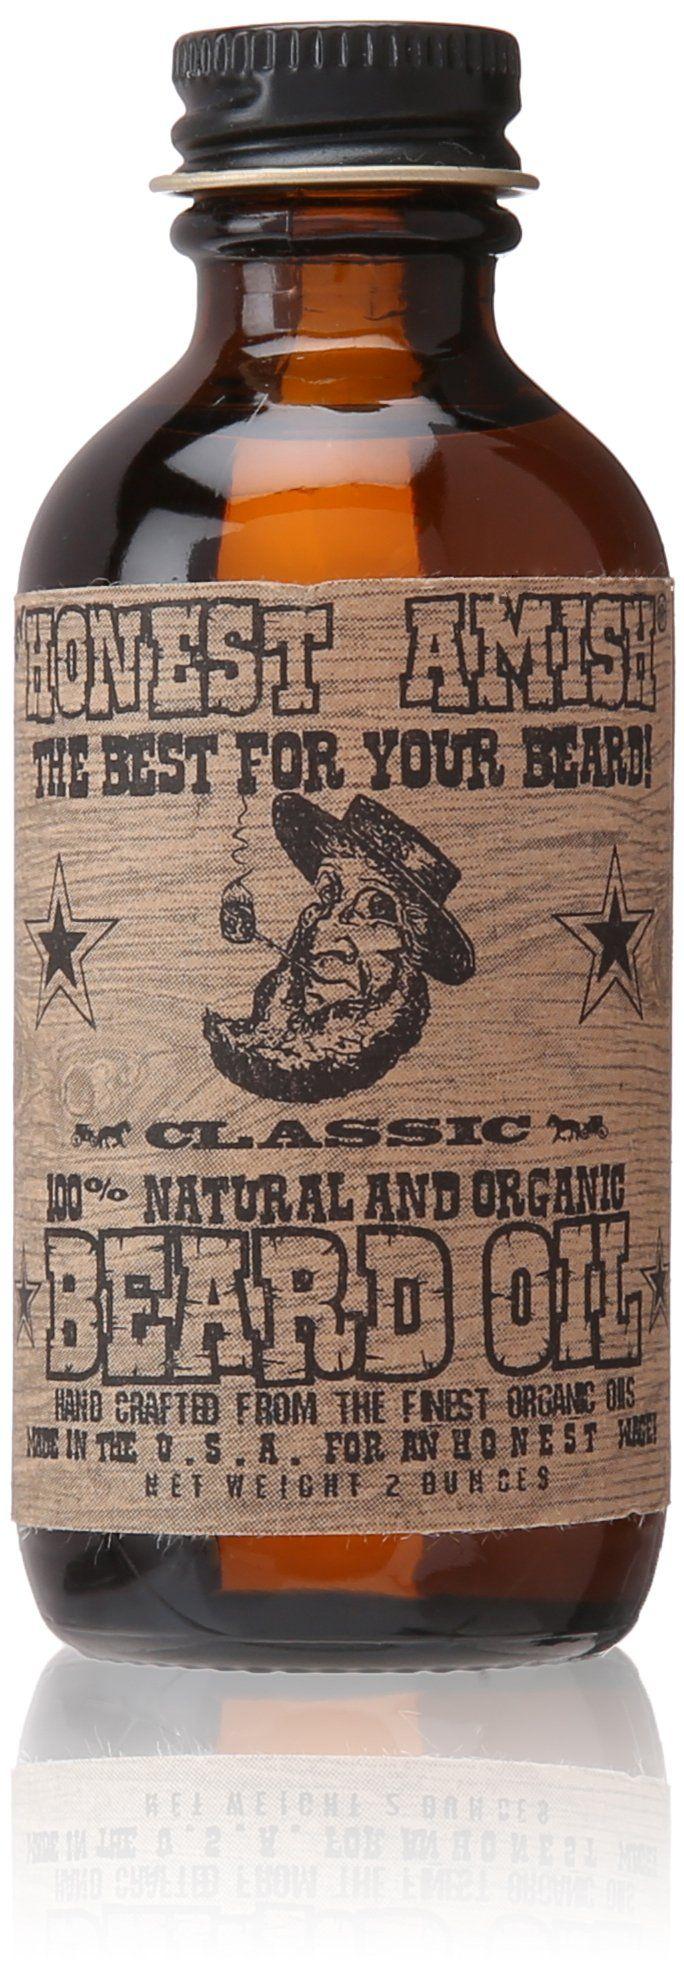 Man Cave Beard Oil : Honest amish classic beard oil oz i love this stuff